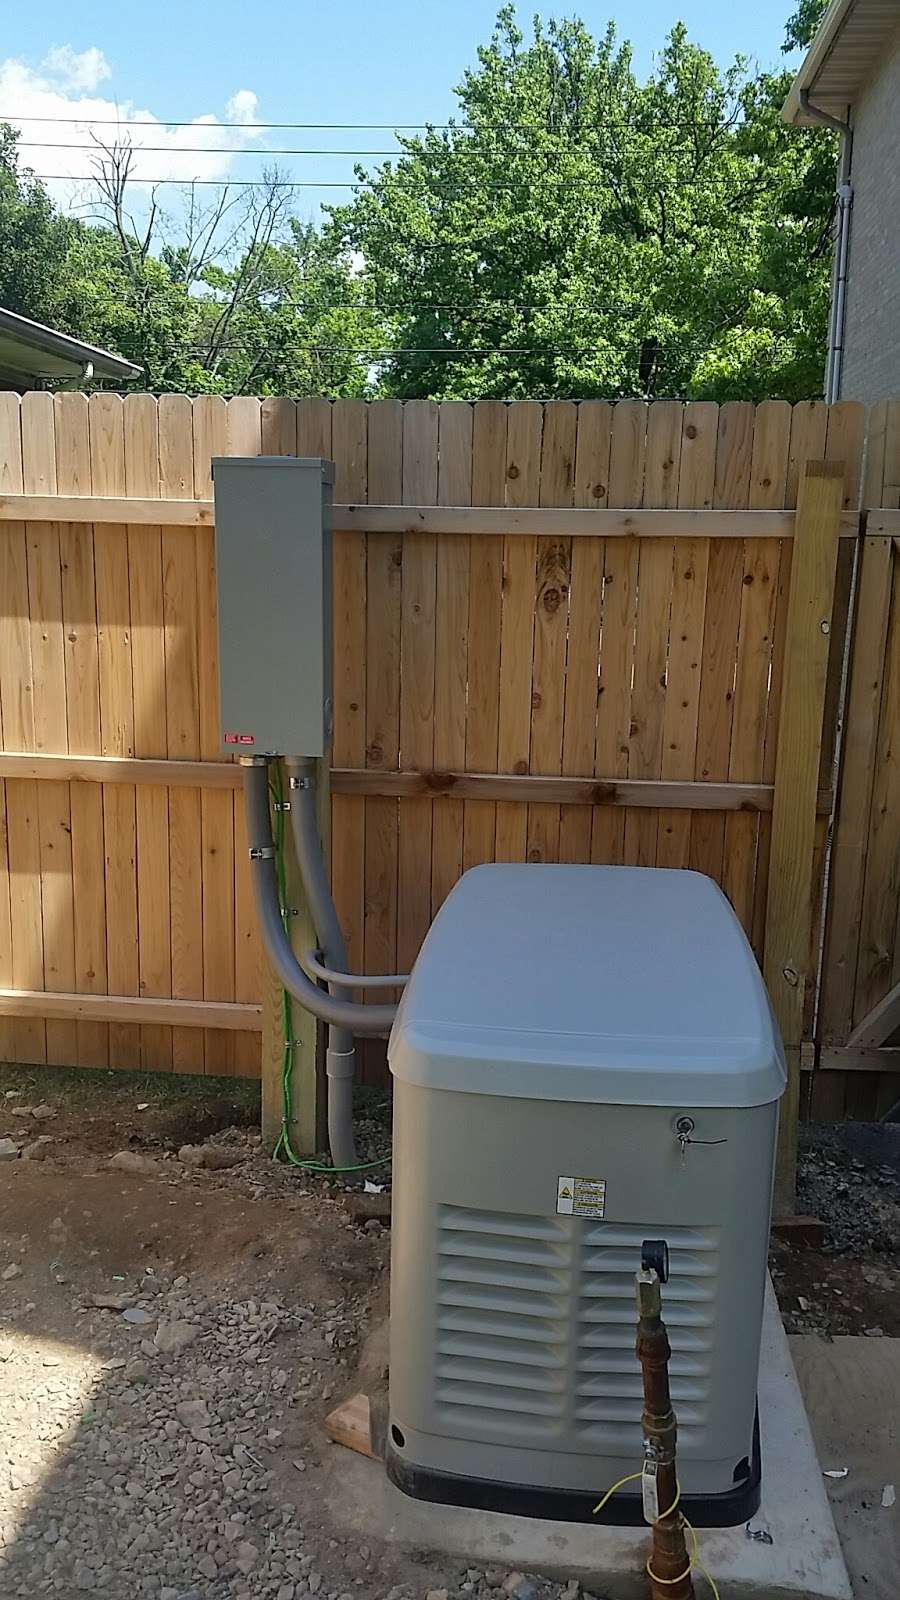 Haddad Electric LLC - electrician  | Photo 8 of 10 | Address: 300 Washington Ave #5, Carlstadt, NJ 07072, USA | Phone: (201) 438-4242